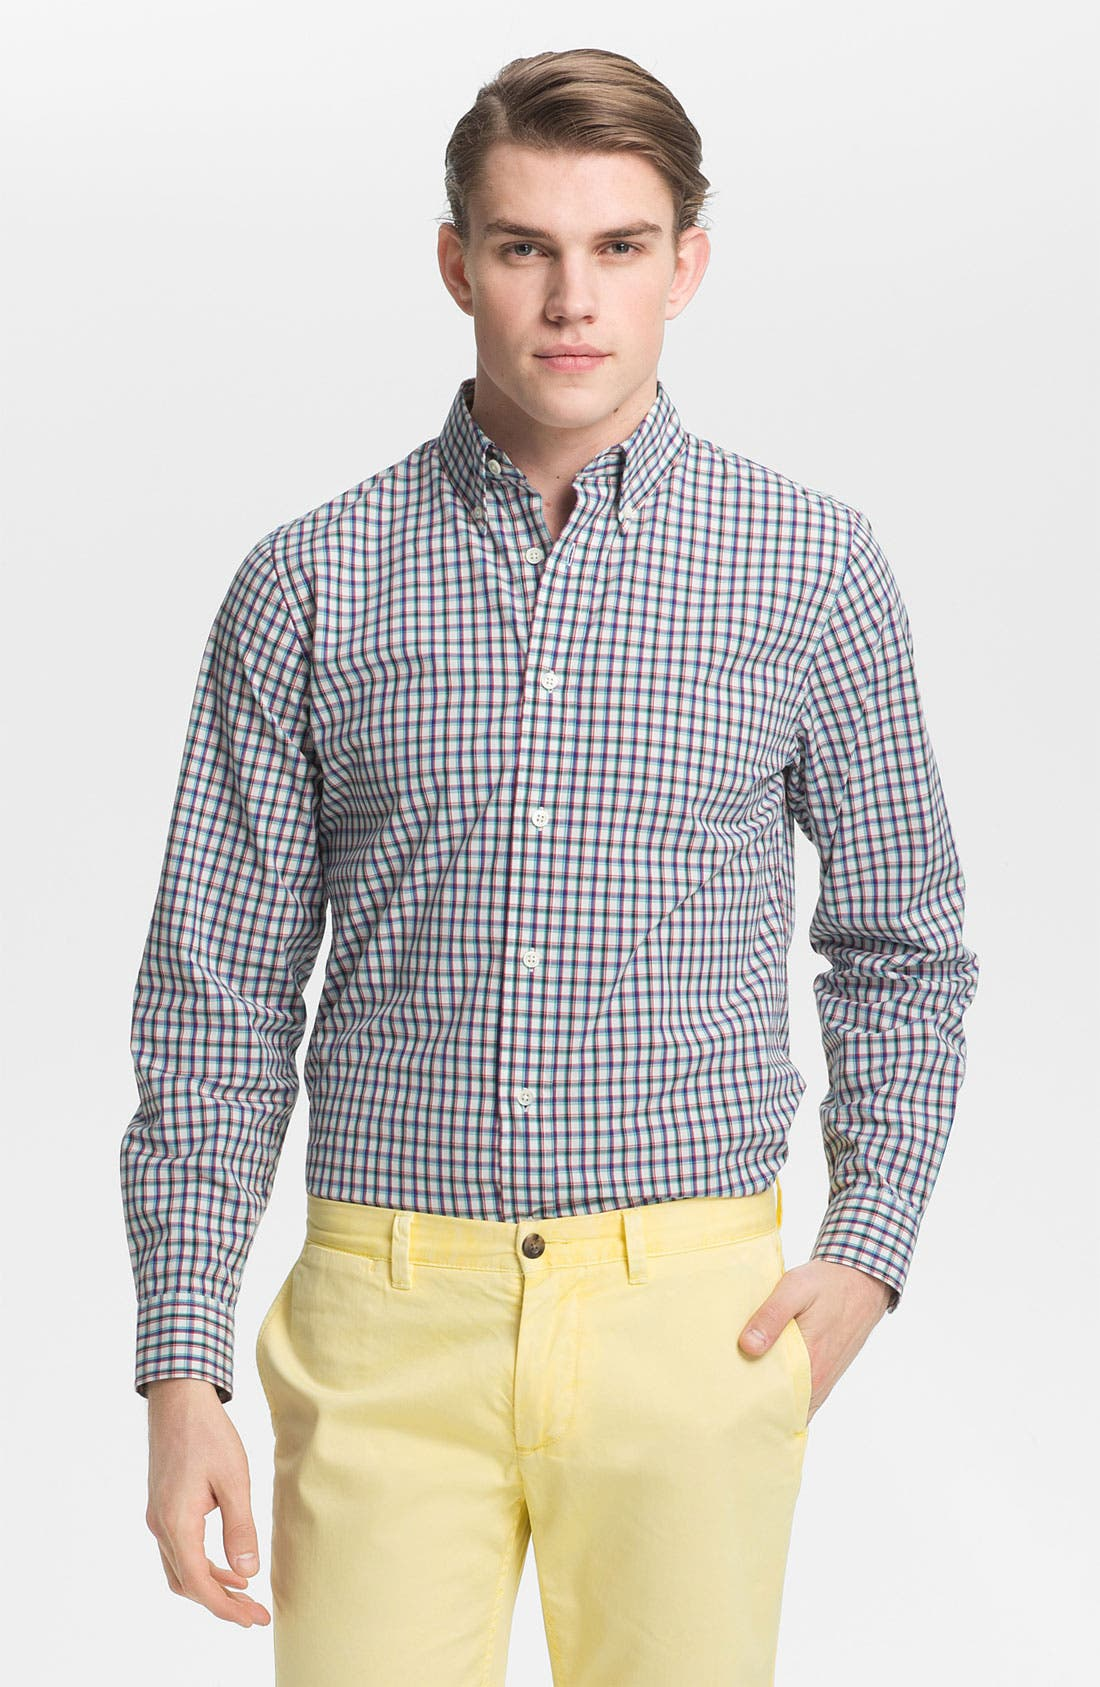 Alternate Image 1 Selected - Jack Spade 'Barbary' Plaid Woven Shirt